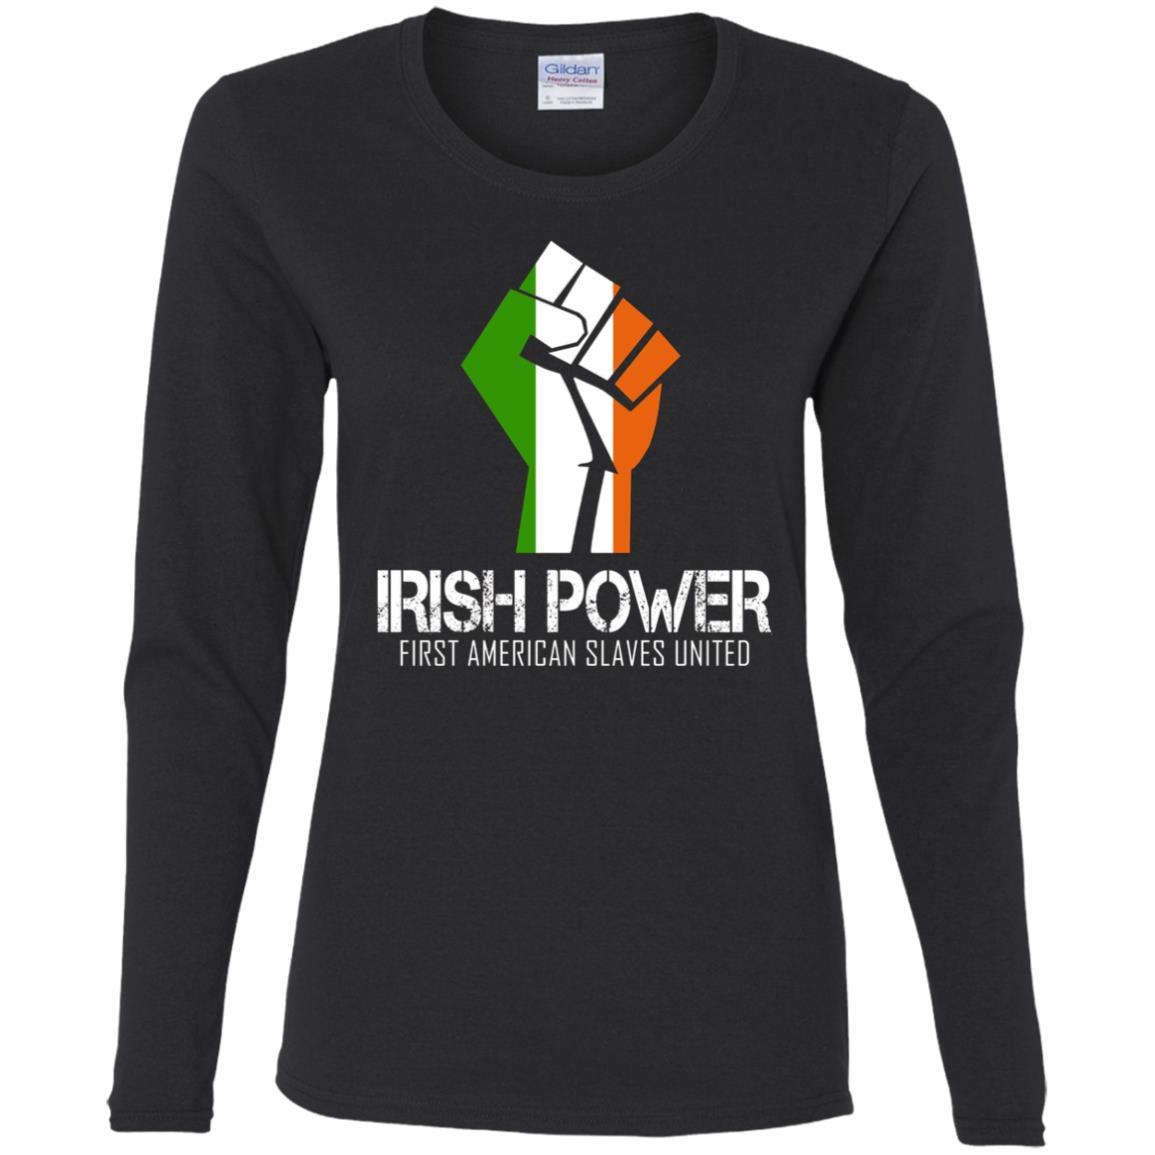 Irish power American slaves united – Cool saying Women Long Sleeve T-Shirt